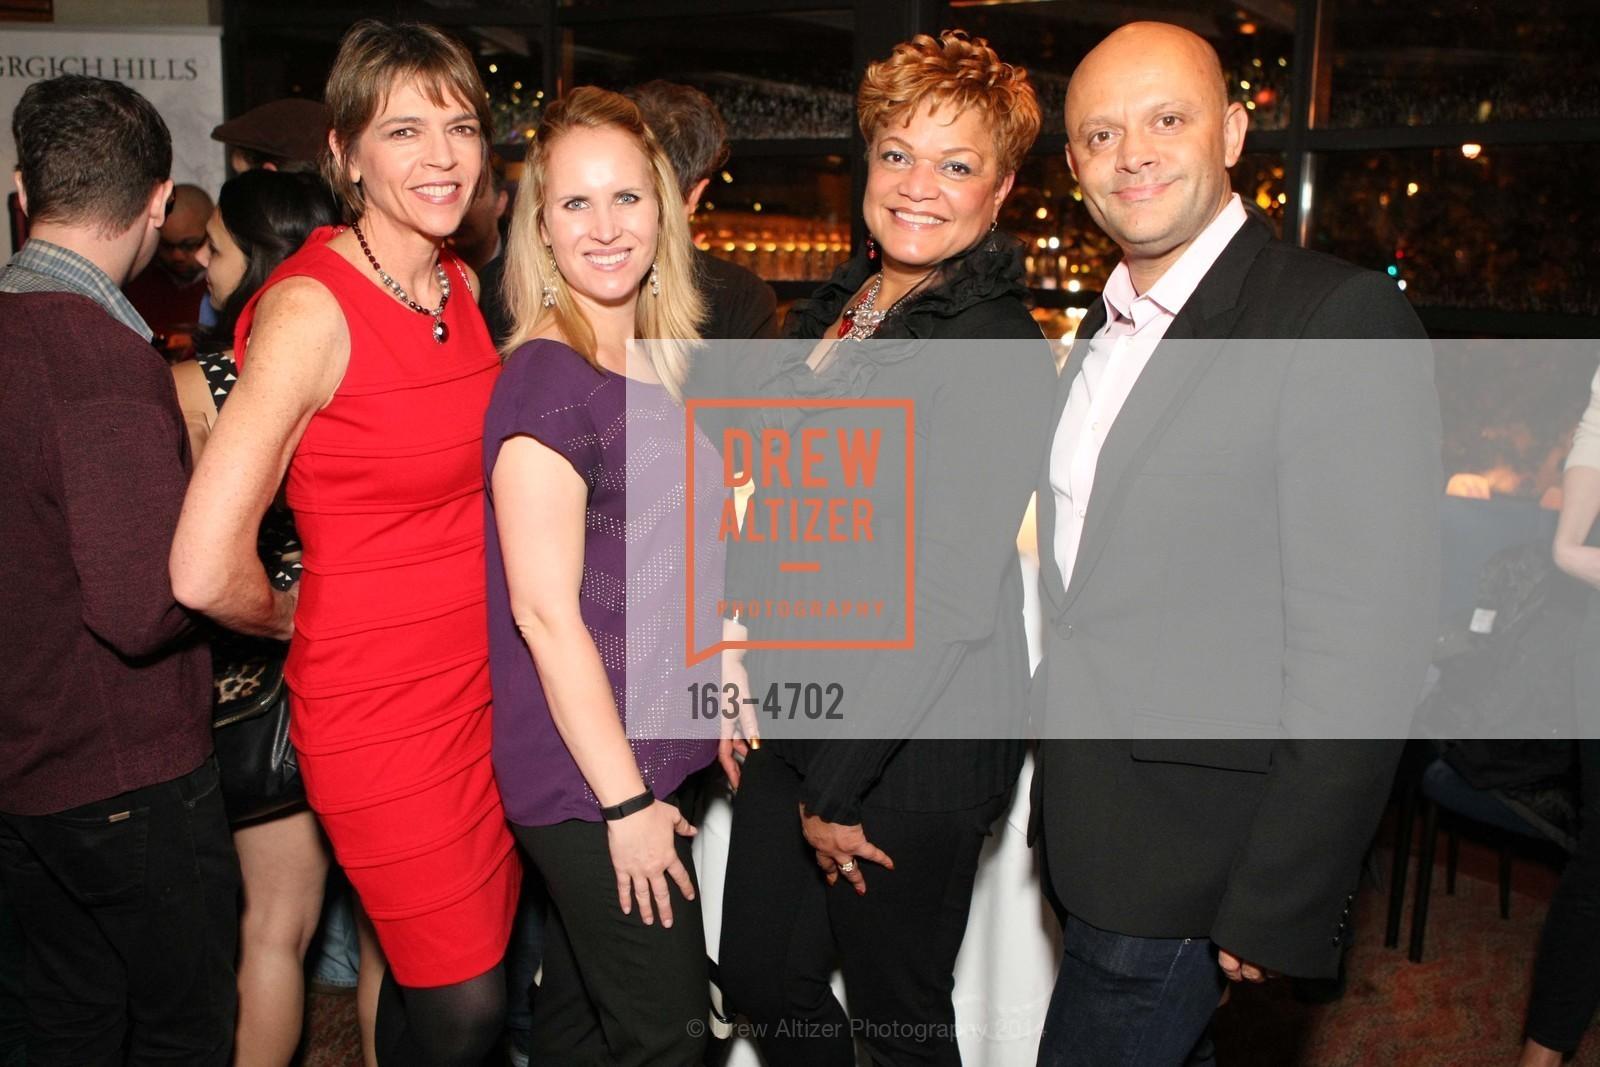 Beth Schnitzer, Rebecca Moore, LaTonya Lawson, Christophe Ley, Photo #163-4702